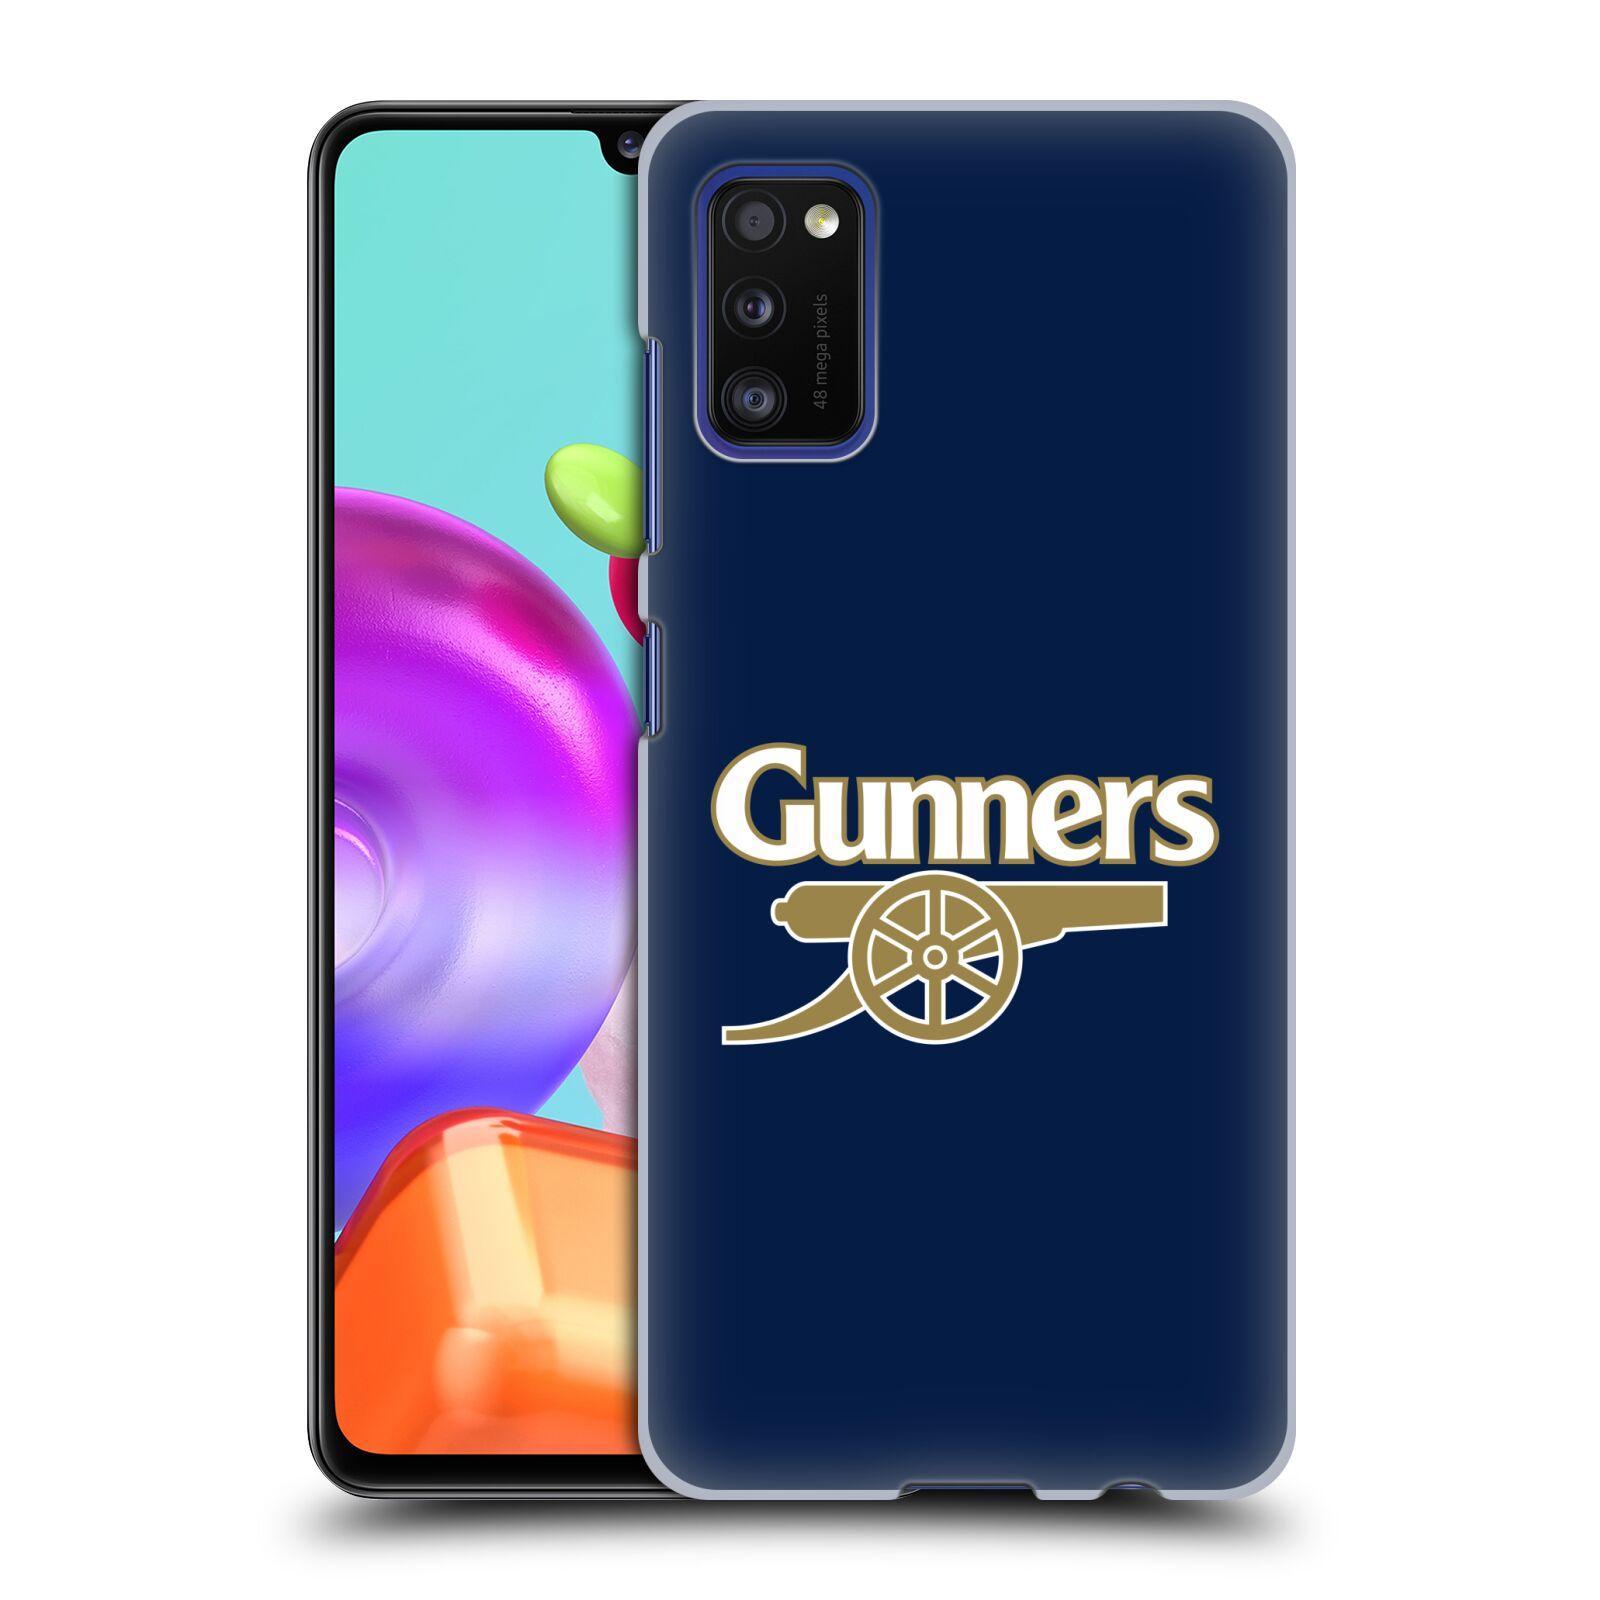 Plastové pouzdro na mobil Samsung Galaxy A41 - Head Case - Arsenal FC - Gunners